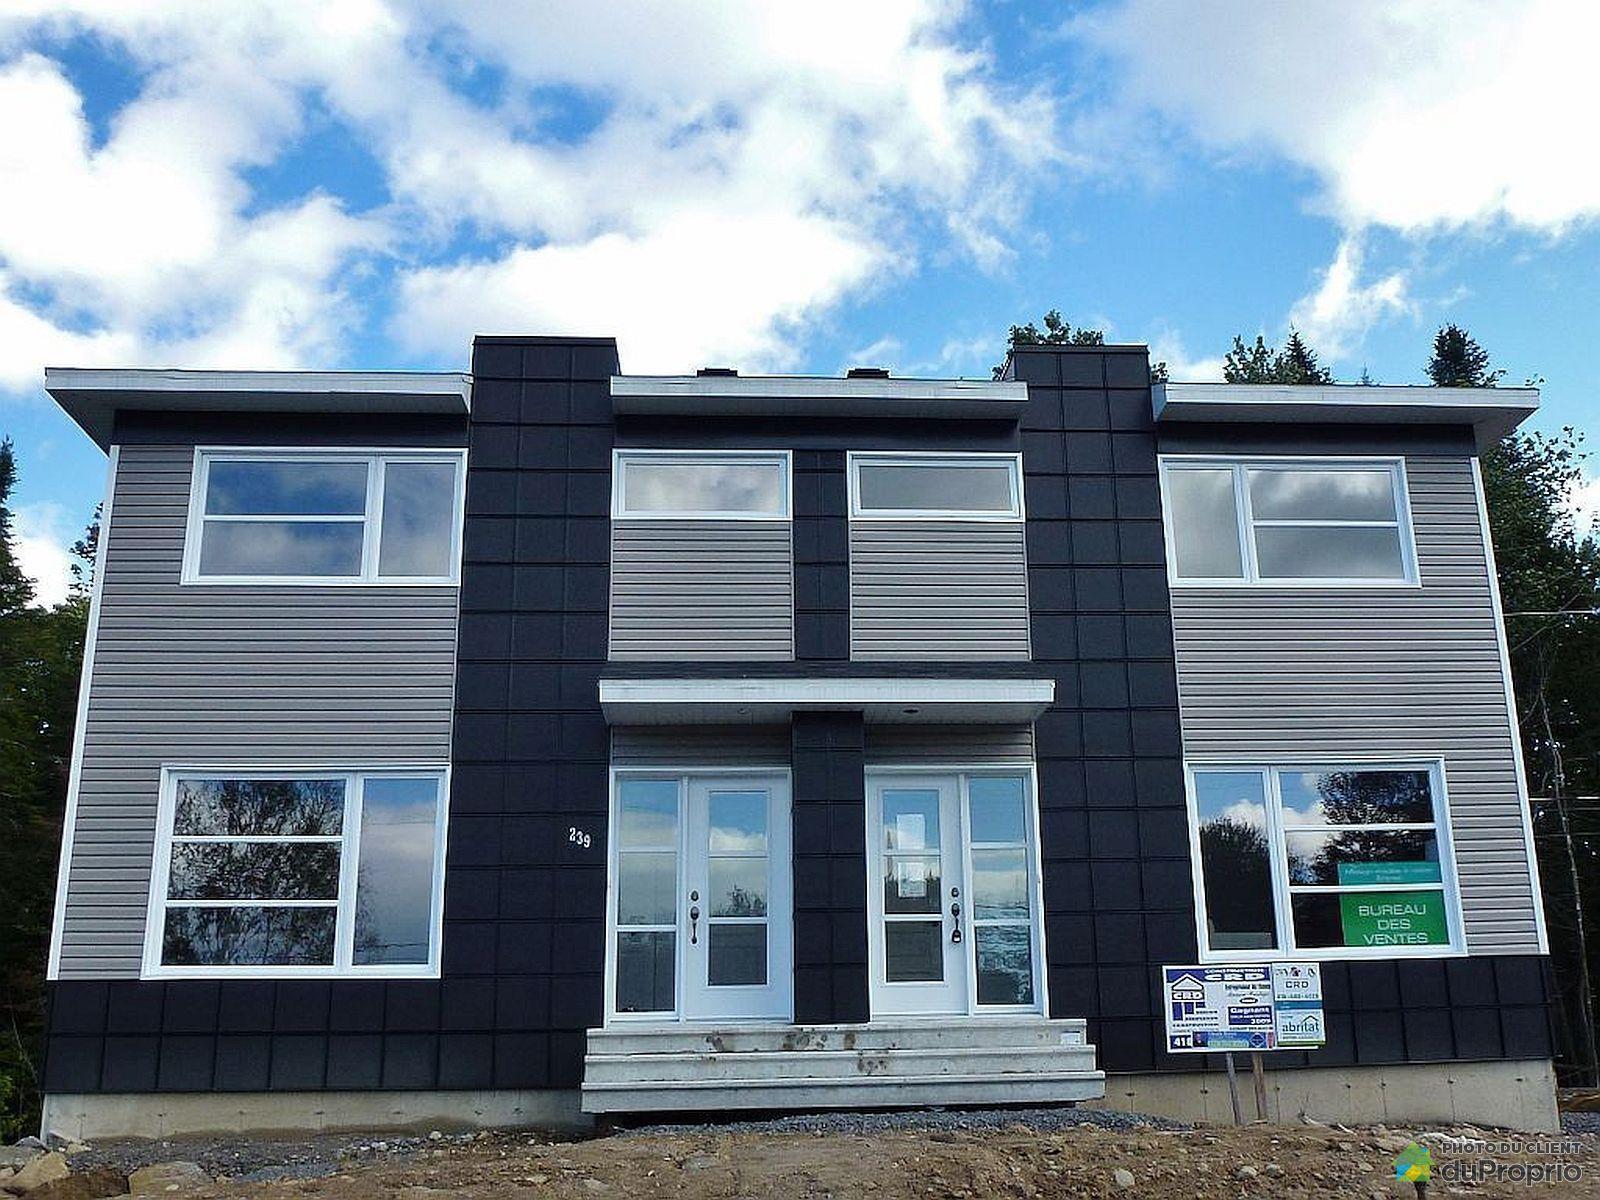 1670 avenue O'neil, Duberger for sale